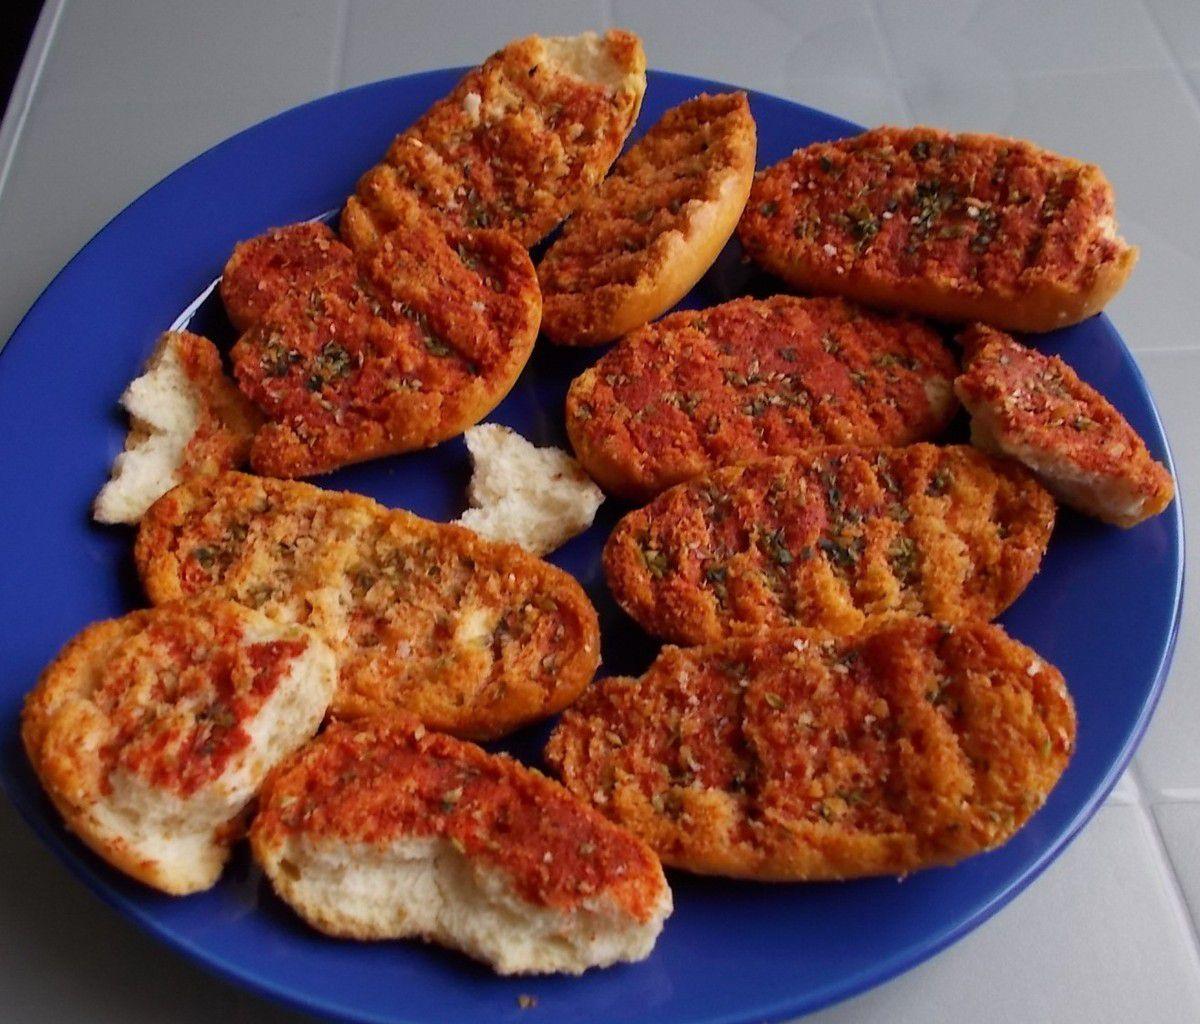 [Lidl] Sol & Mar Tomatenbrötchen (Pan tostado con tomate)